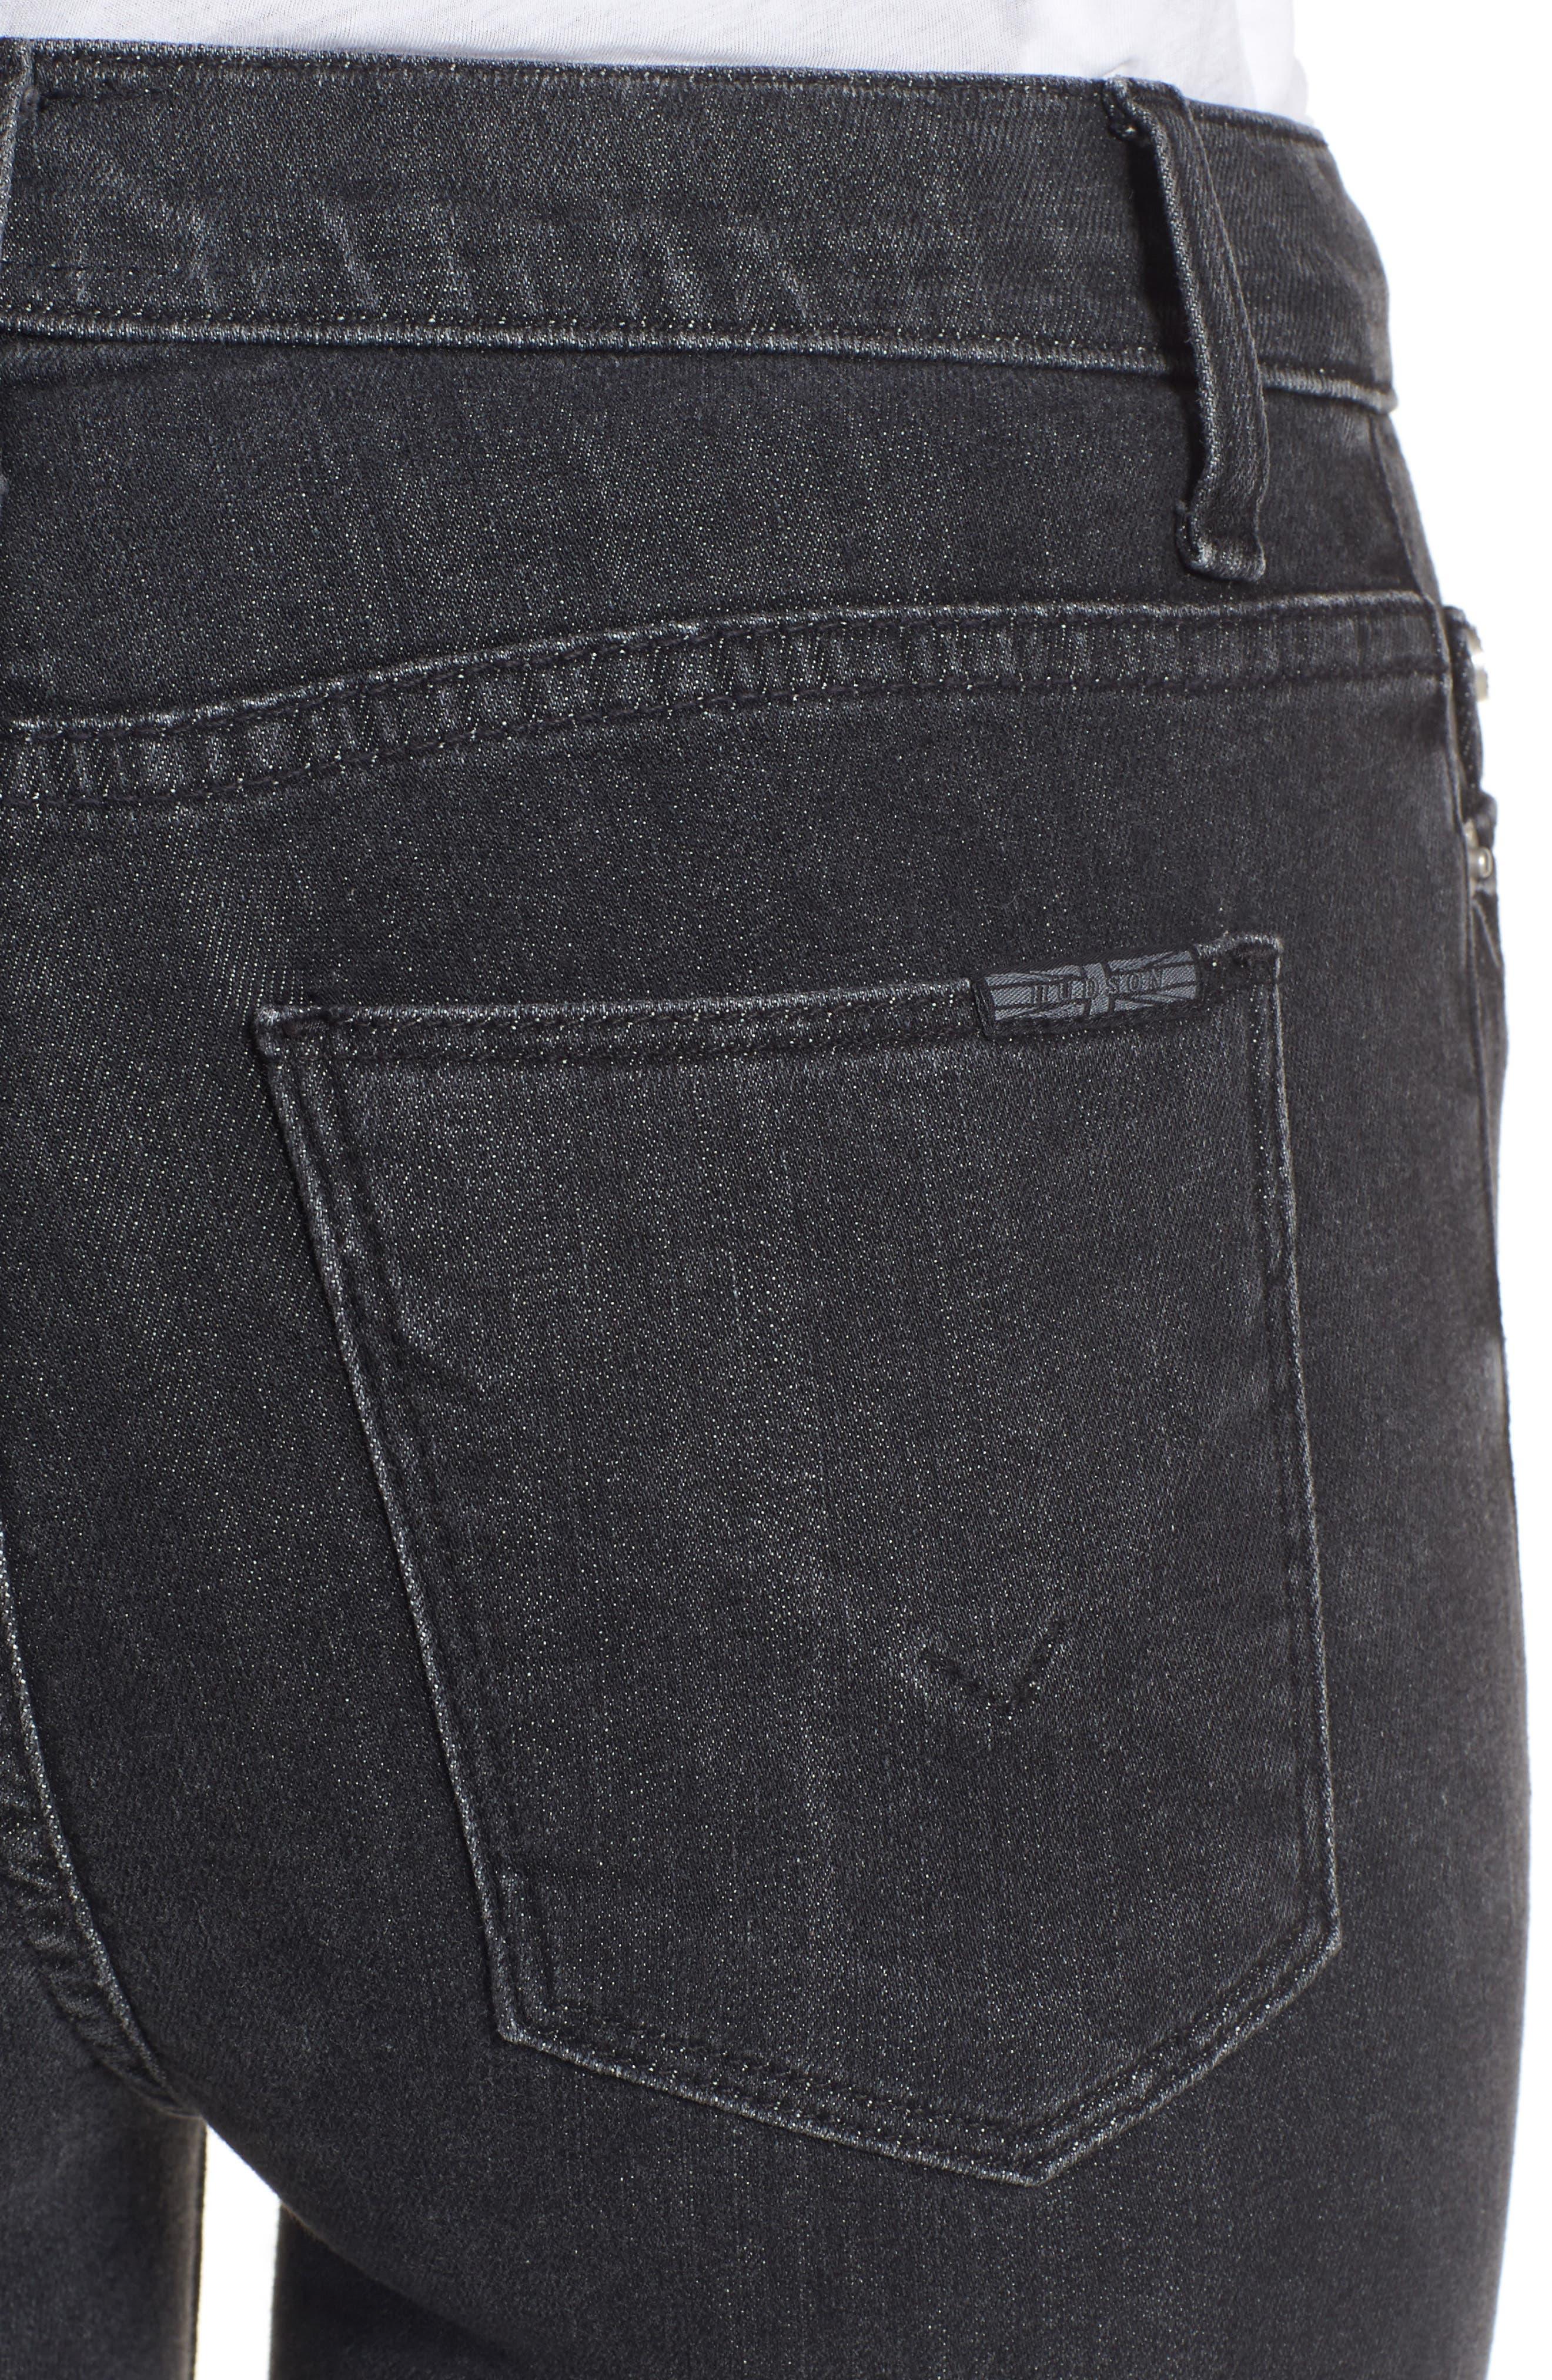 Hudson Barbara High Waist Super Skinny Jeans,                             Alternate thumbnail 4, color,                             064